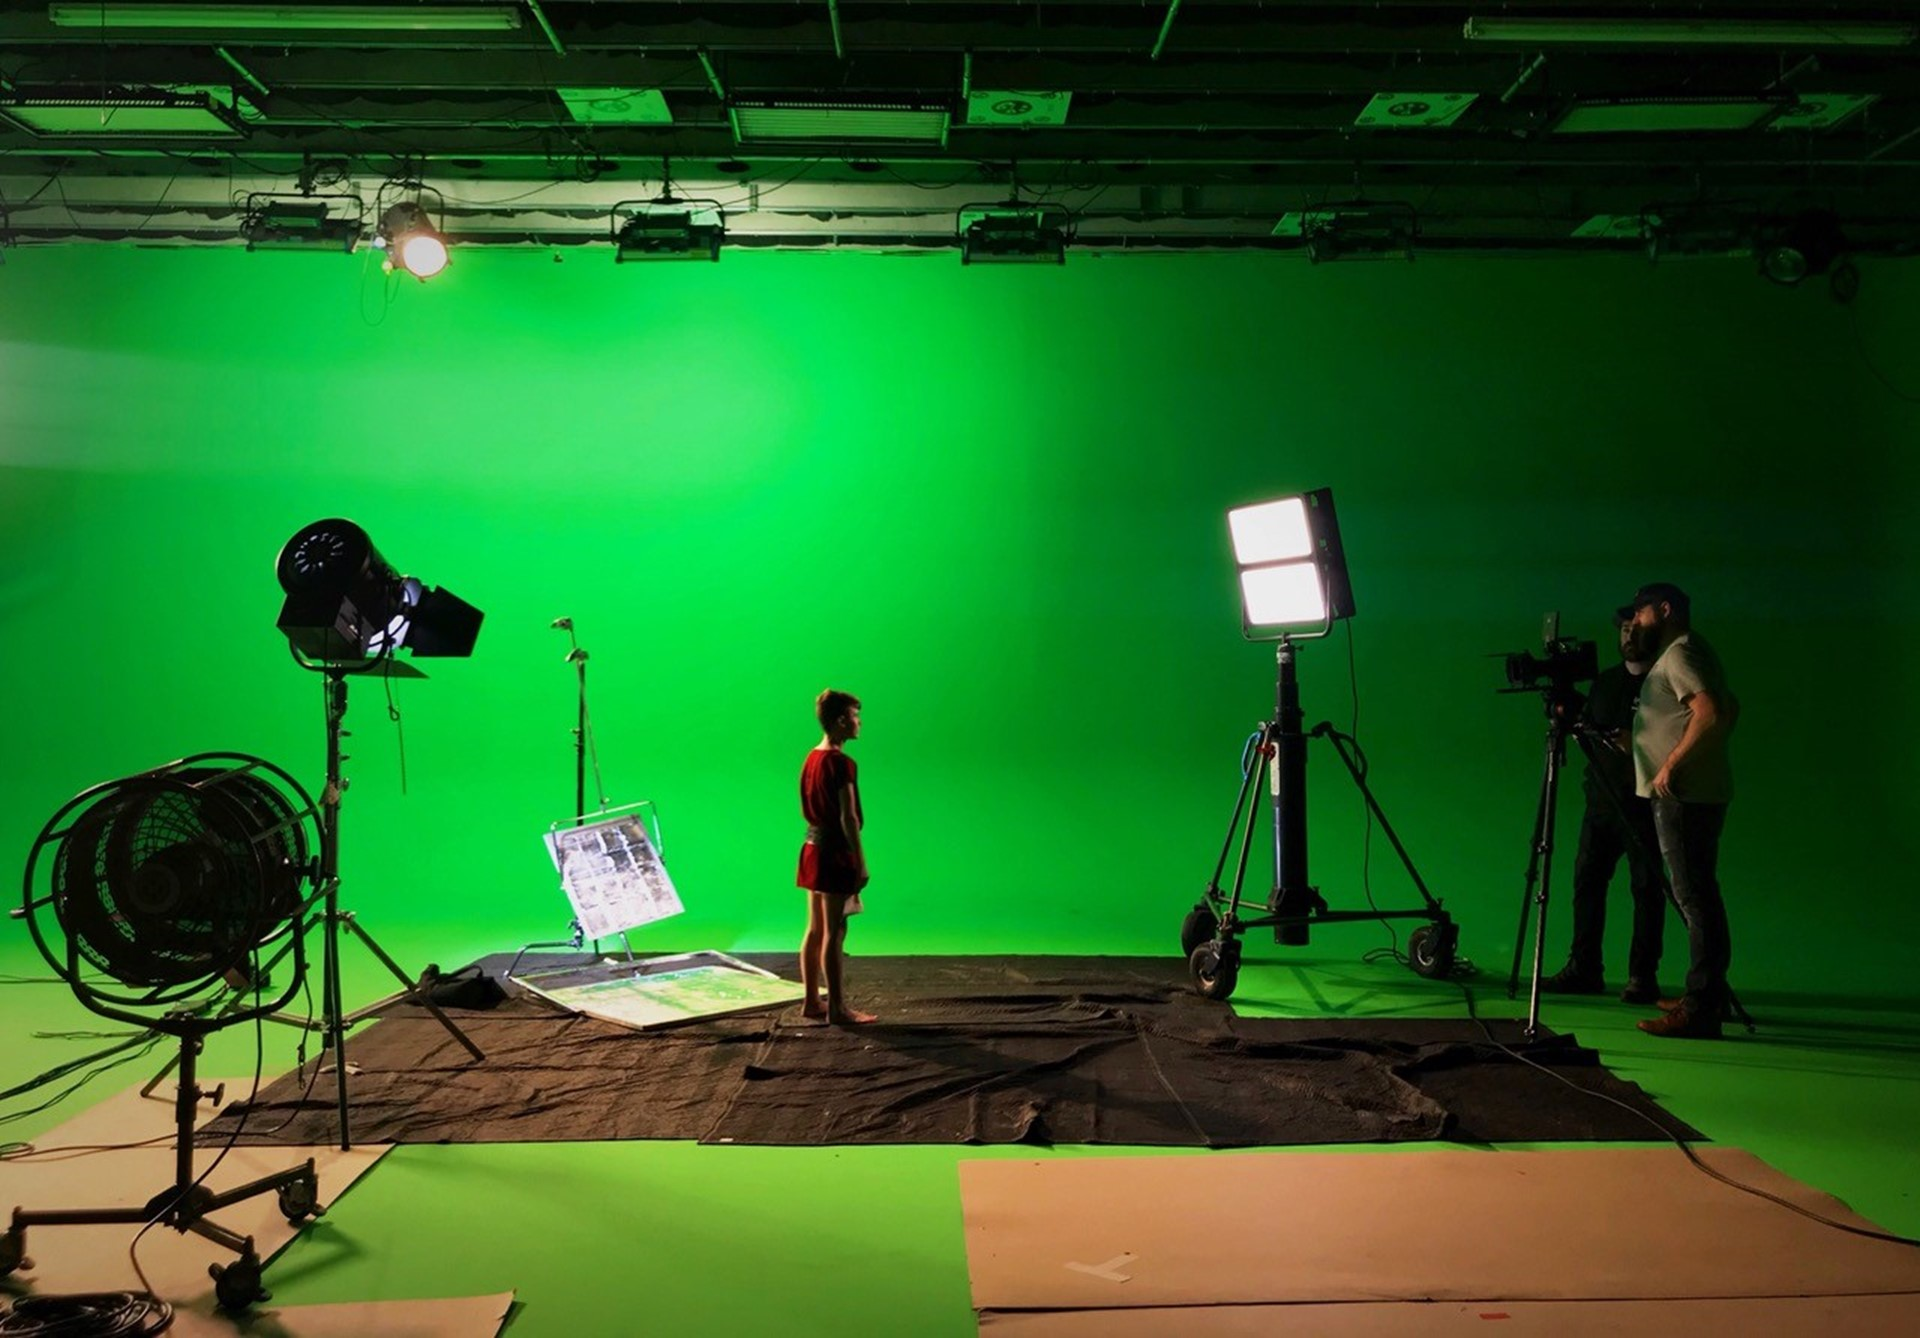 5 tips for lighting a Green Screen | Litepanels | Litepanels